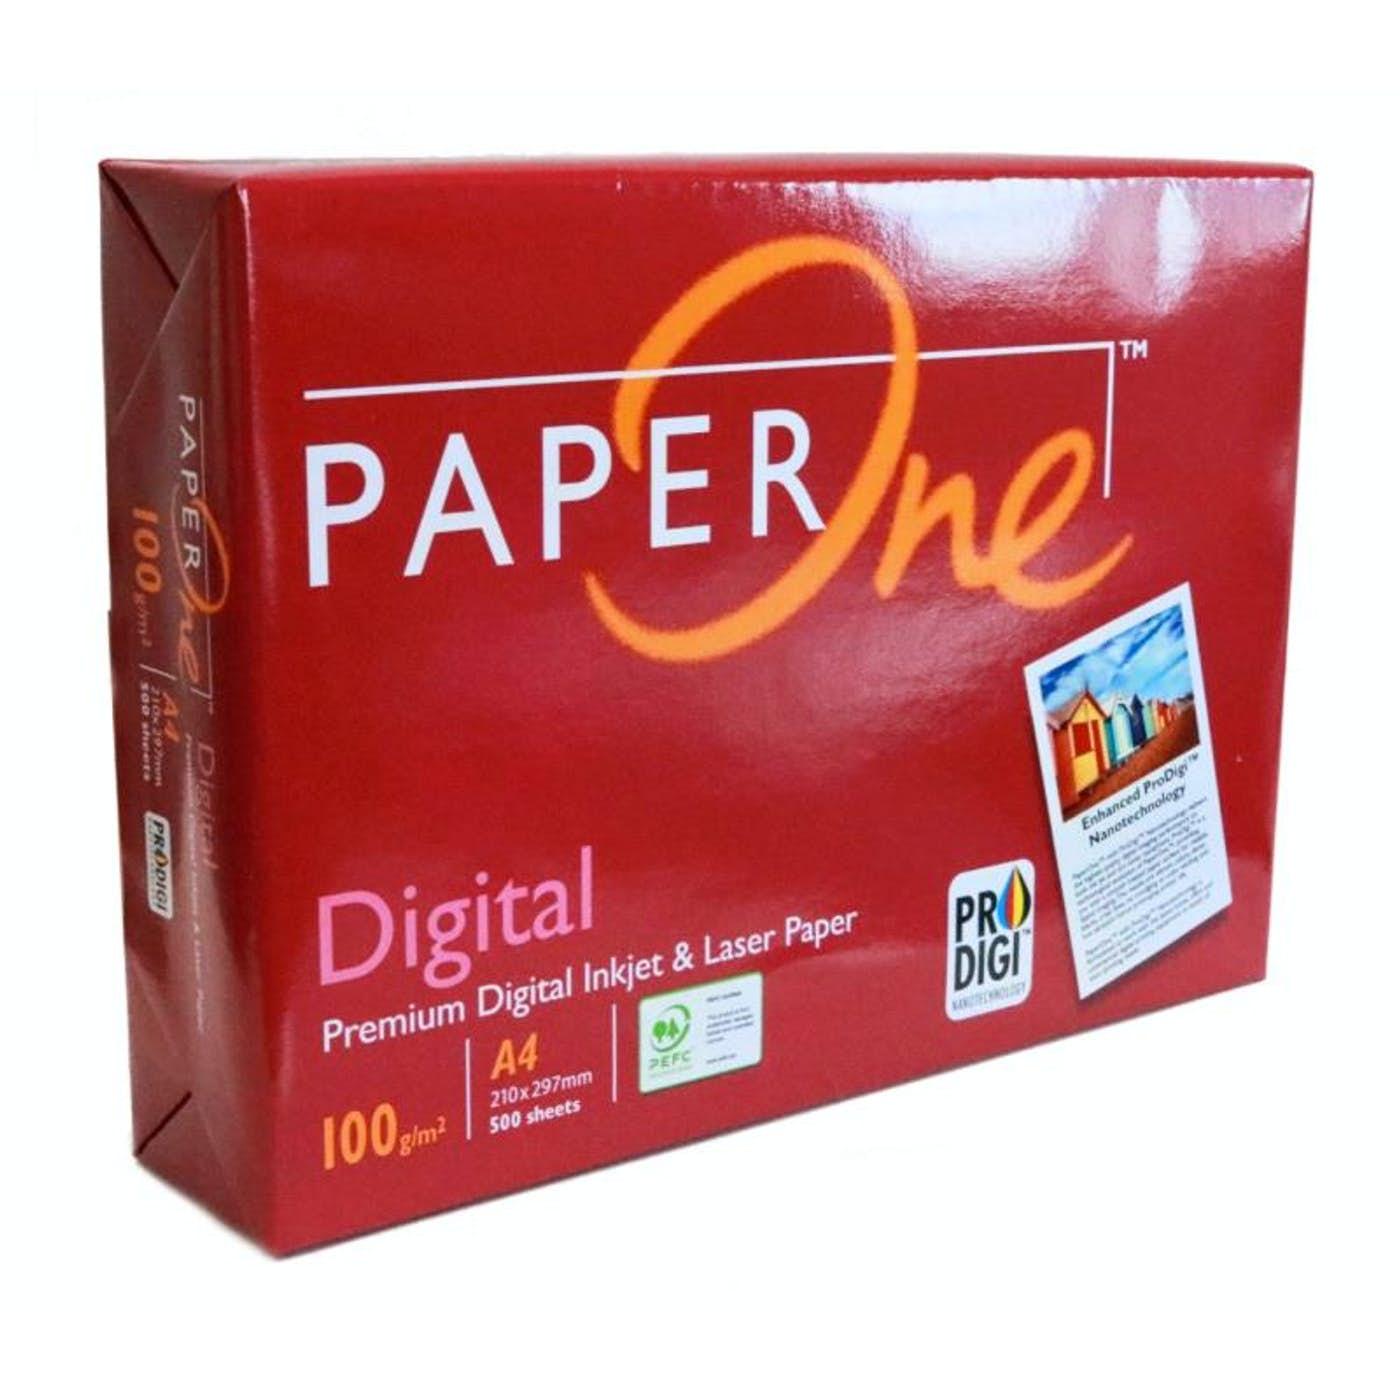 PAPERONE PRESENTATION A4 COPY PAPER 100GSM